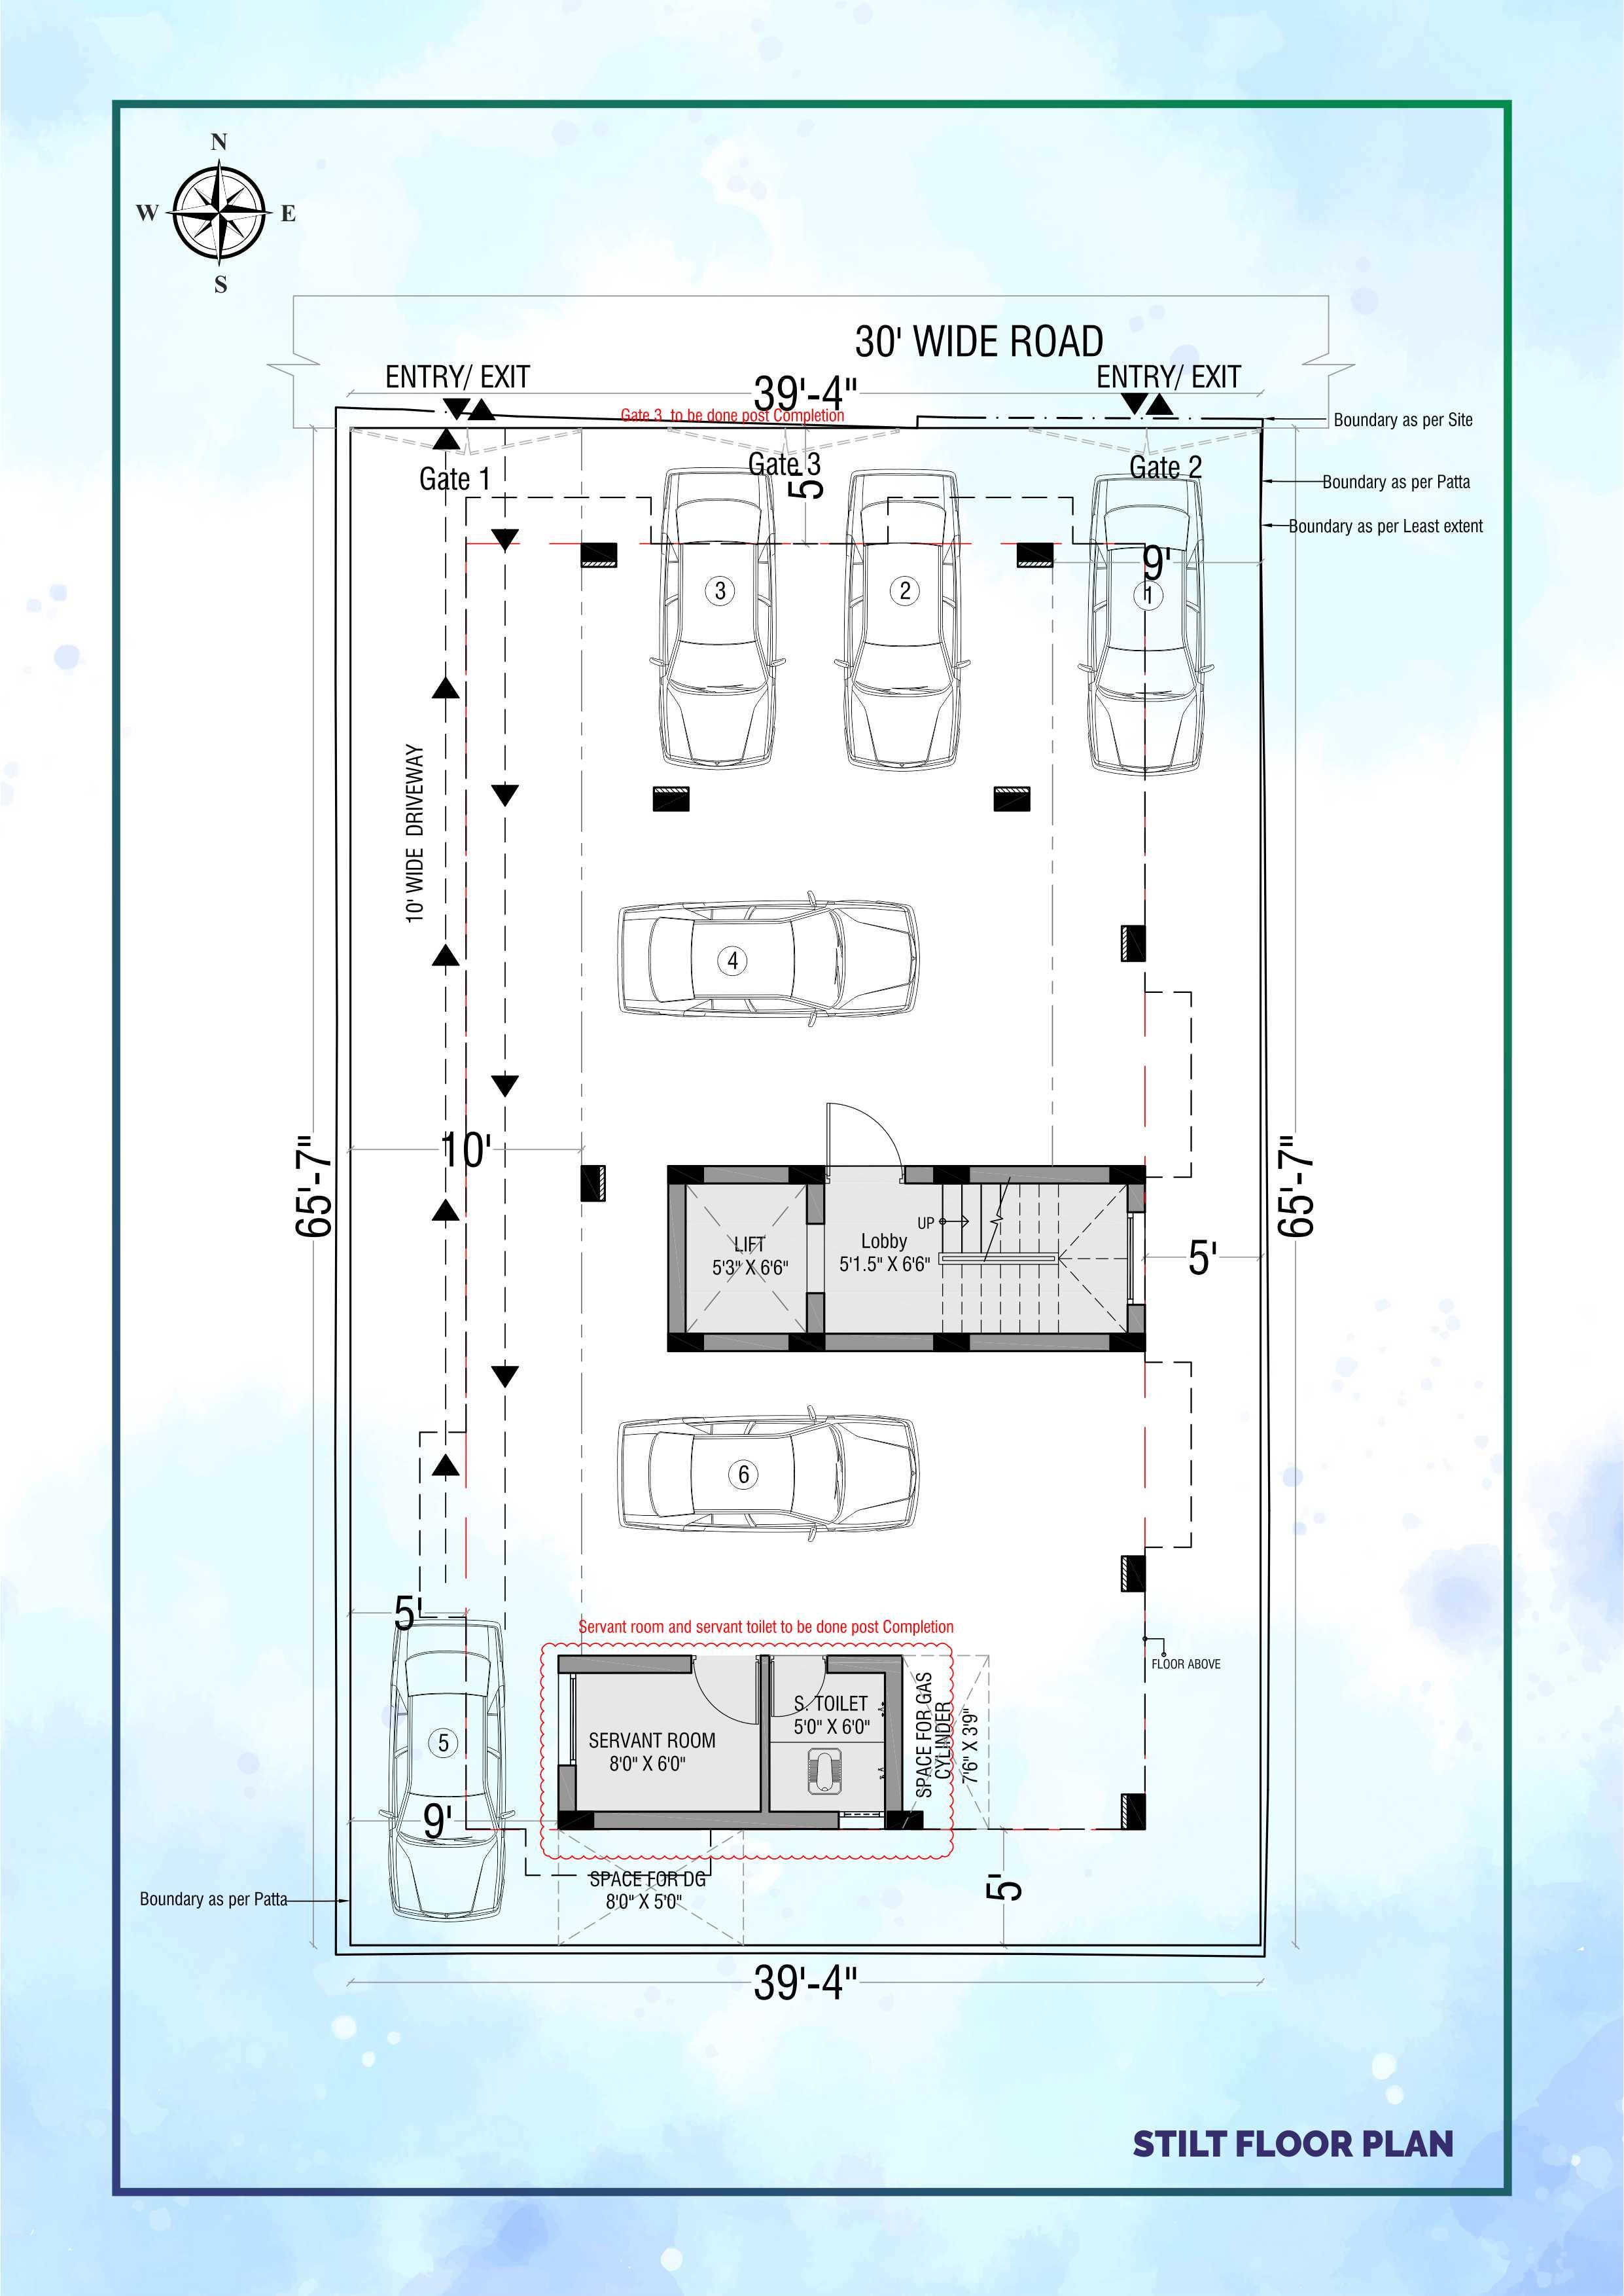 https://firmfoundations.in/projects/floorplans/thumbnails/16087227921Mani_Bhavanam_Stilt.jpg